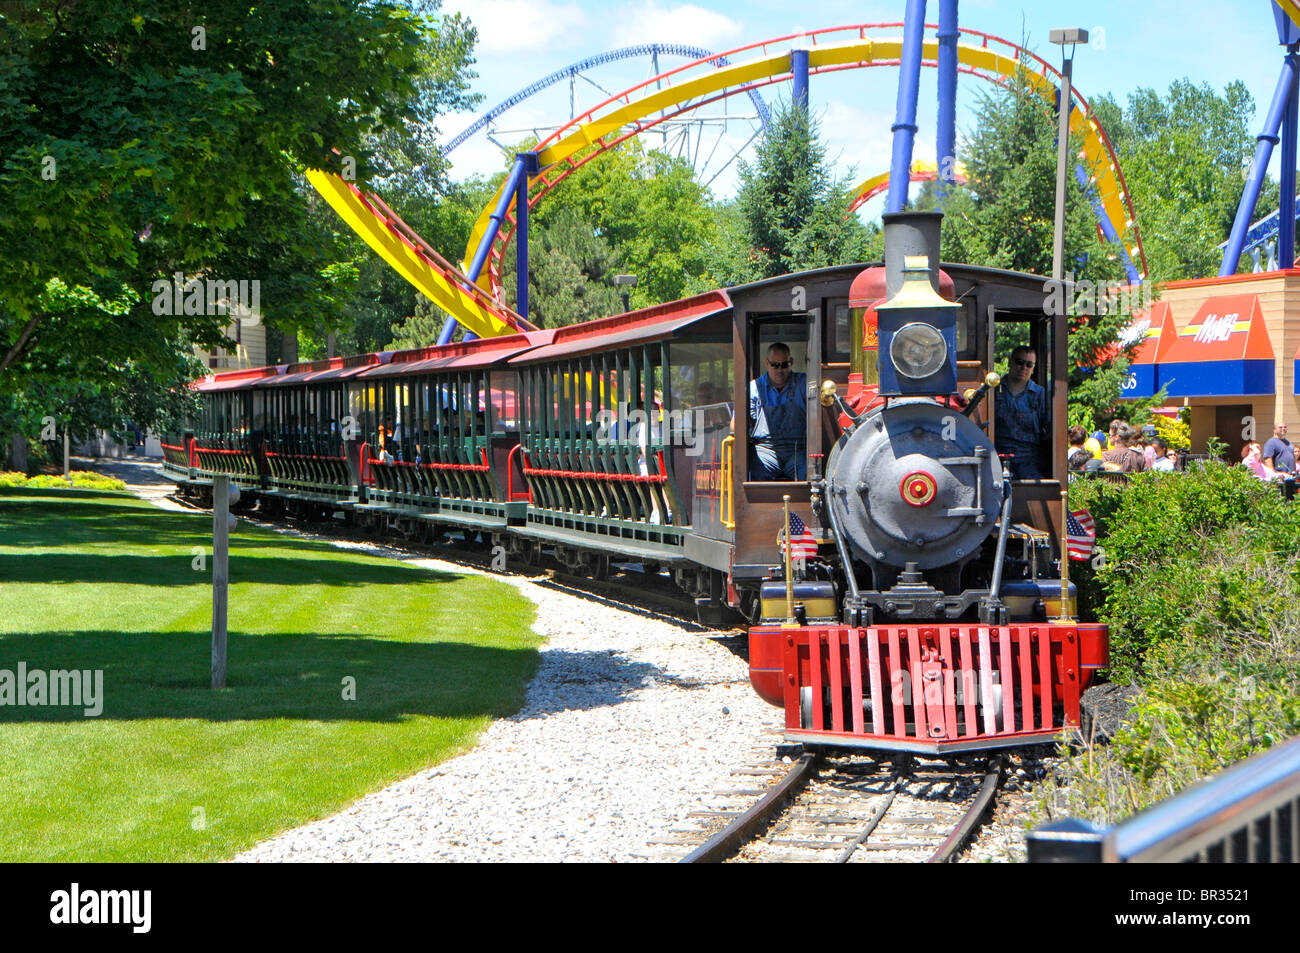 Carnival Floor Plan Train Ride Cedar Point Amusement Park Sandusky Ohio Stock